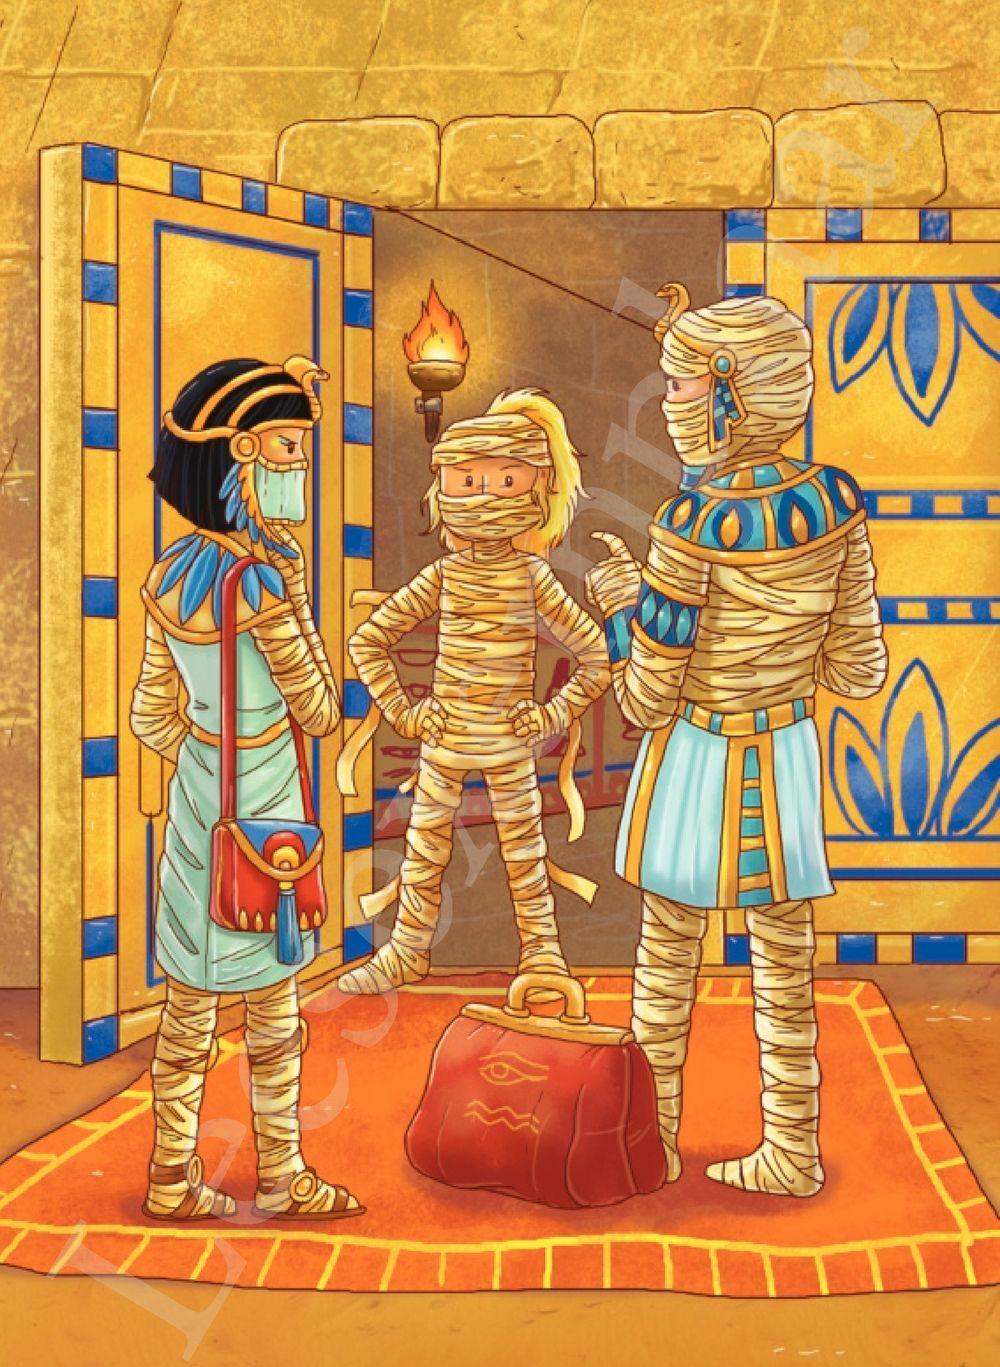 Preview: De geest van de mummie (E6)